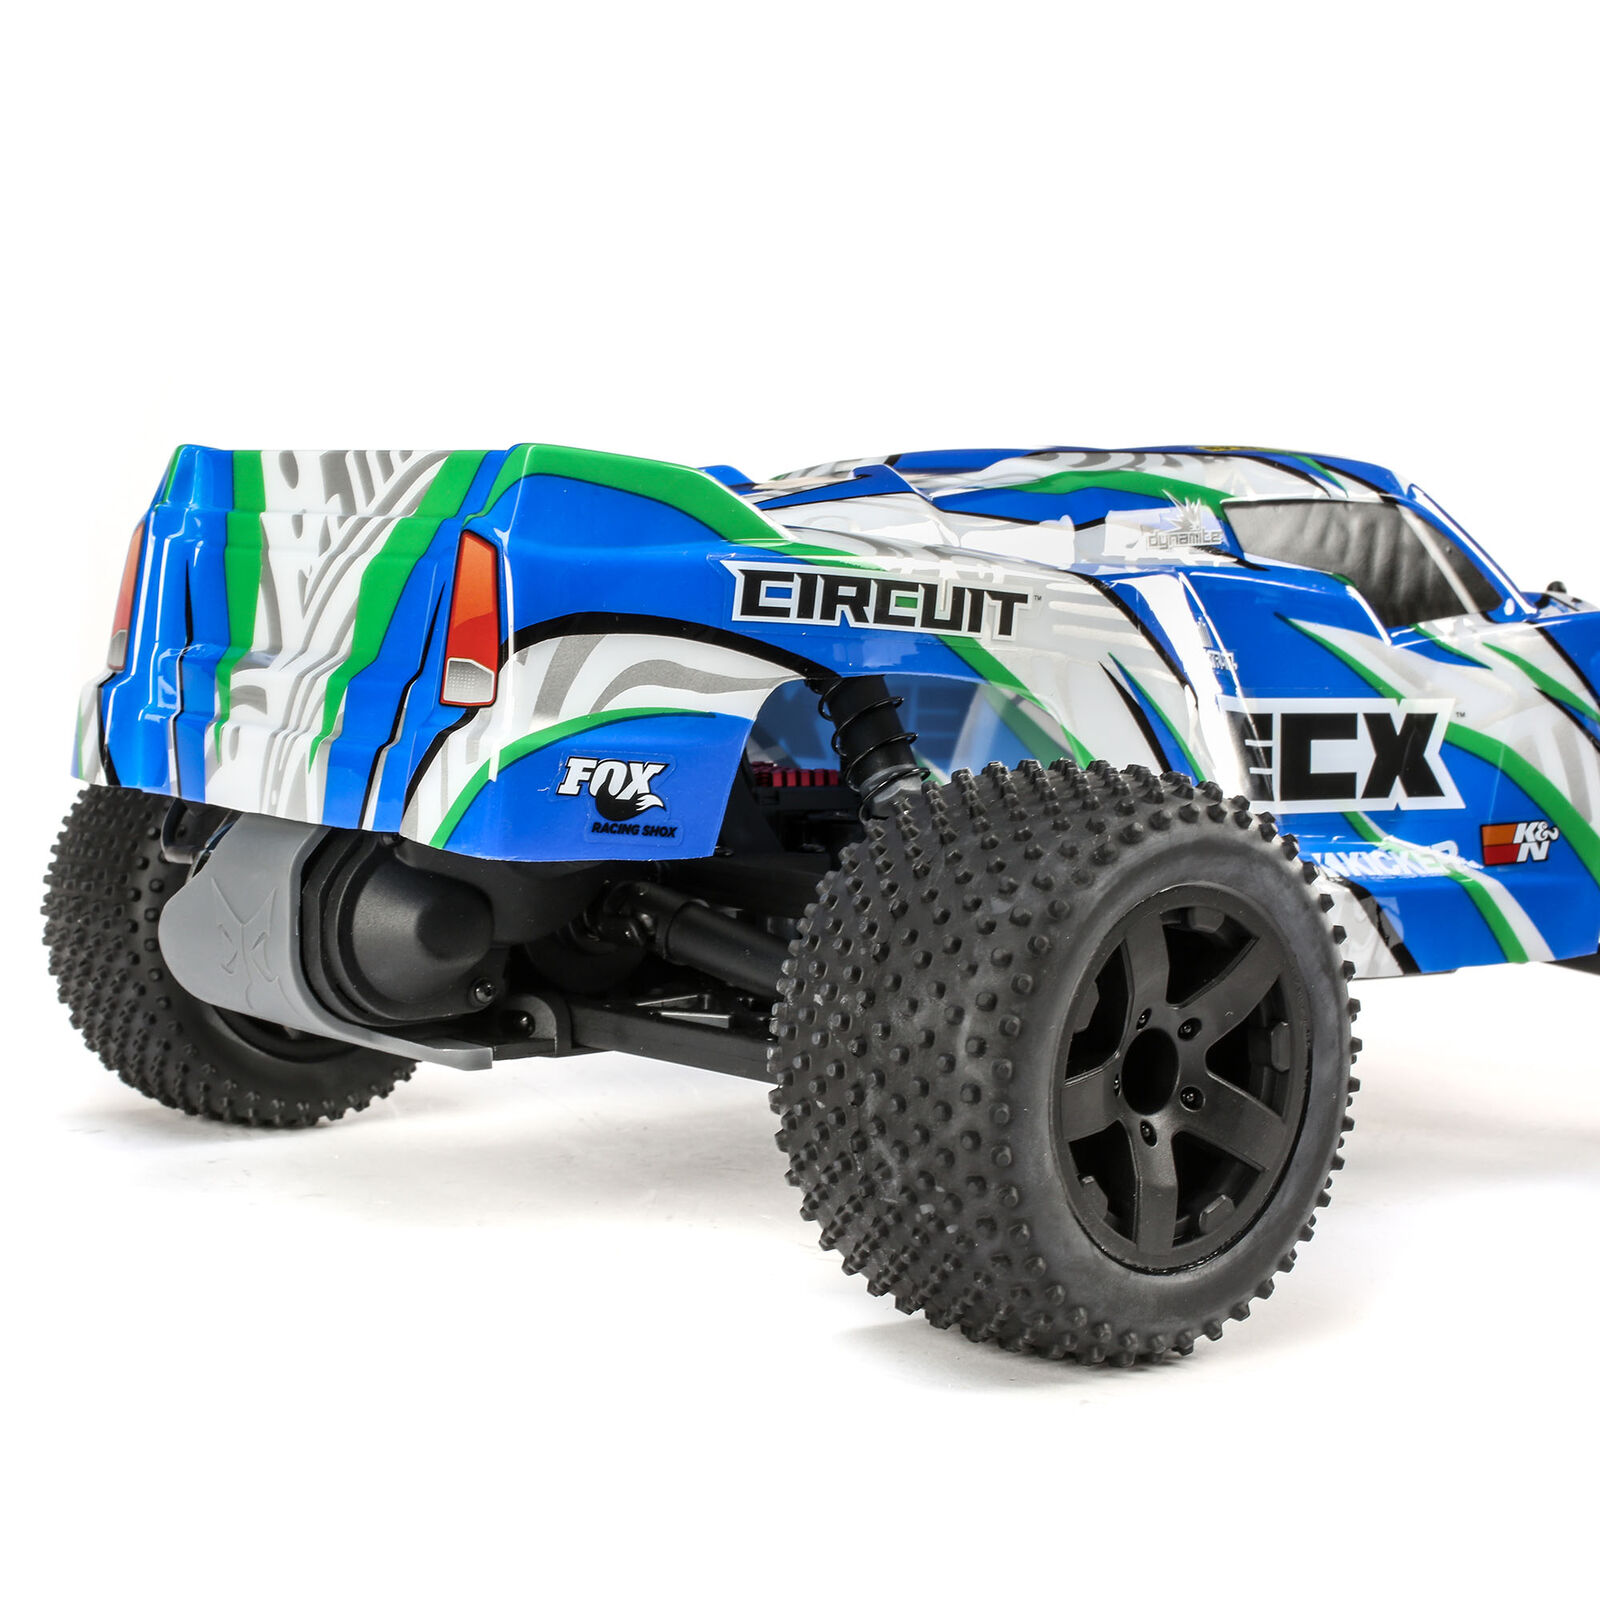 1/10 Circuit 2WD Stadium Truck Brushed RTR, Blue/White